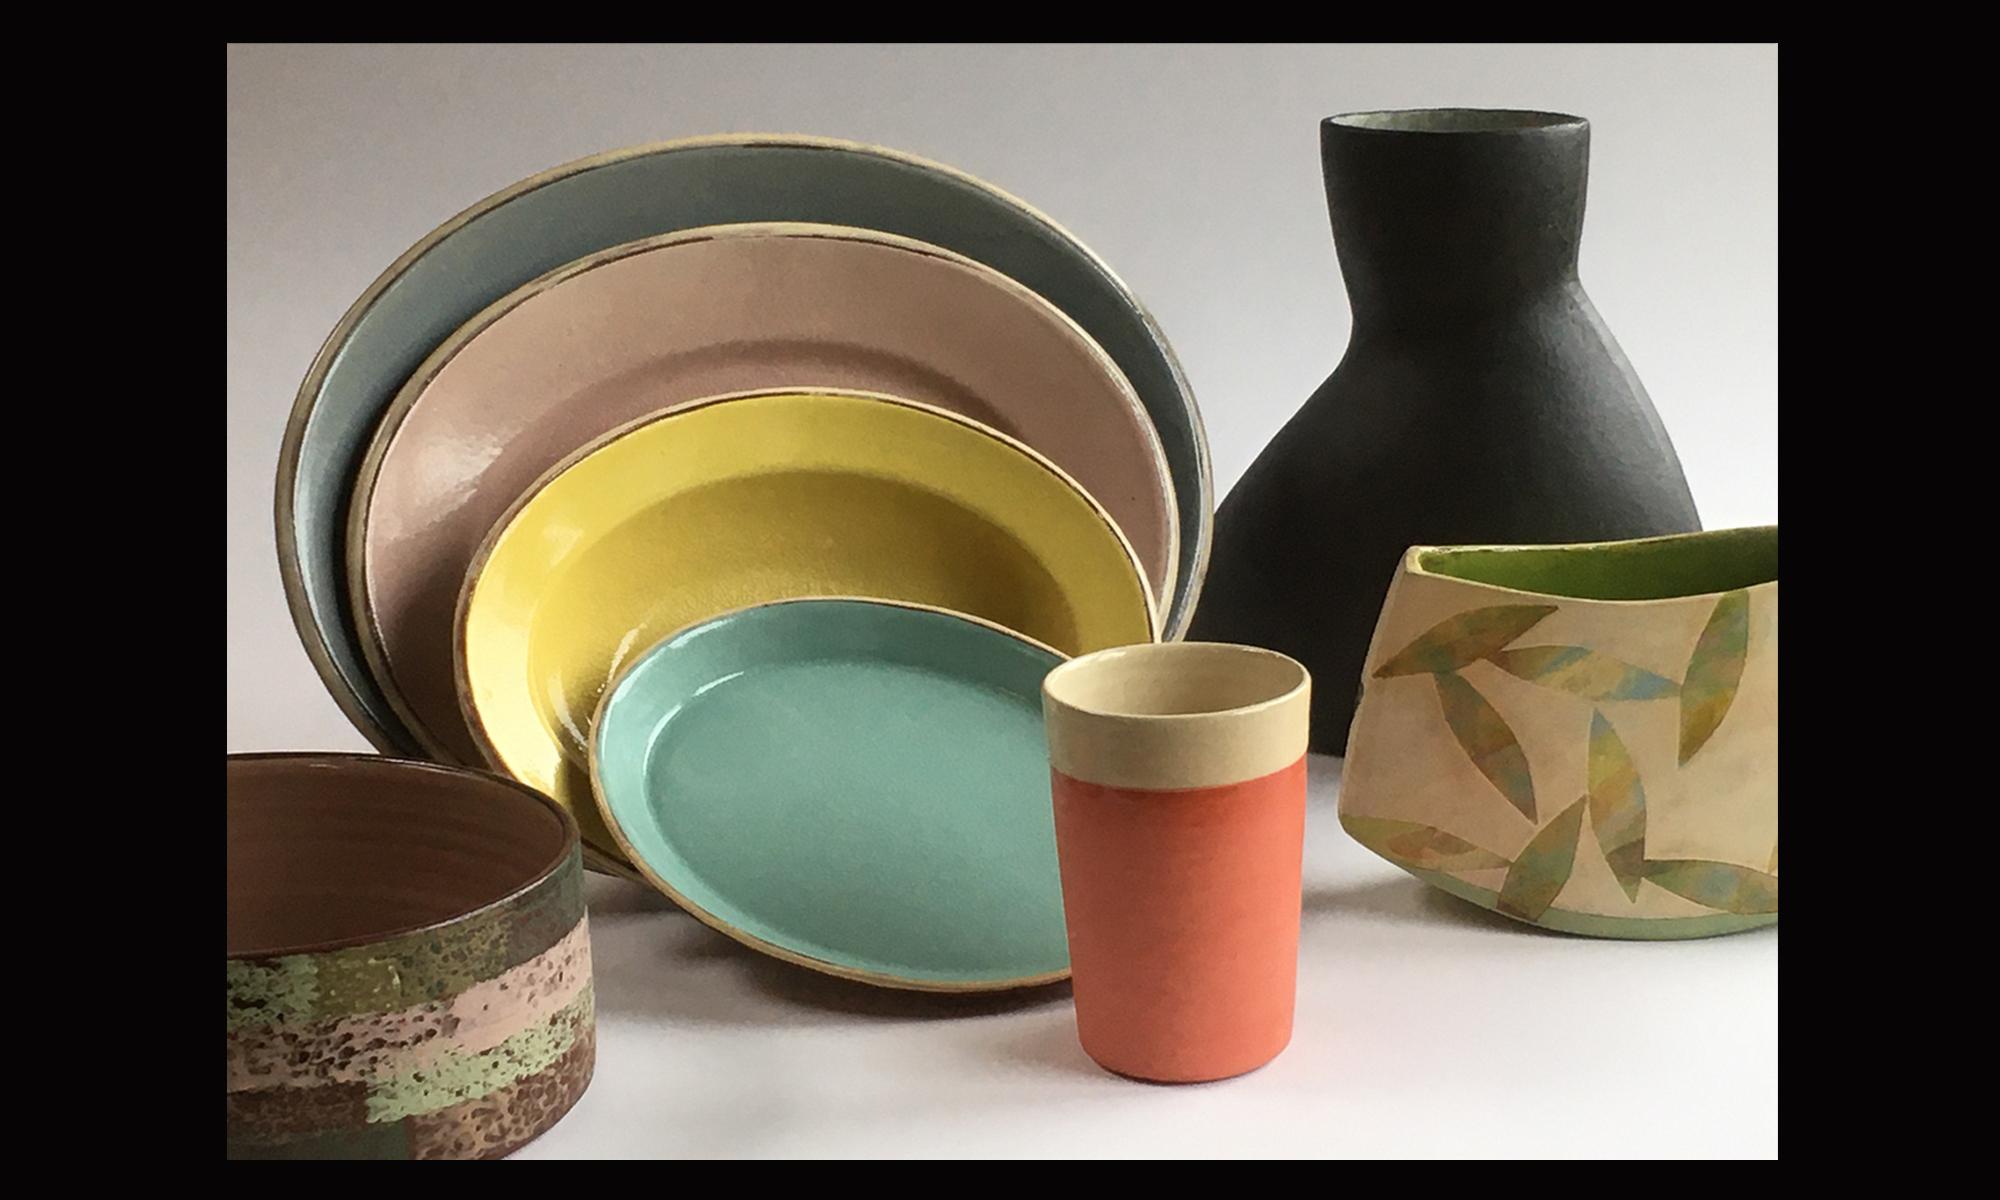 Keramiker Vibeke Krog